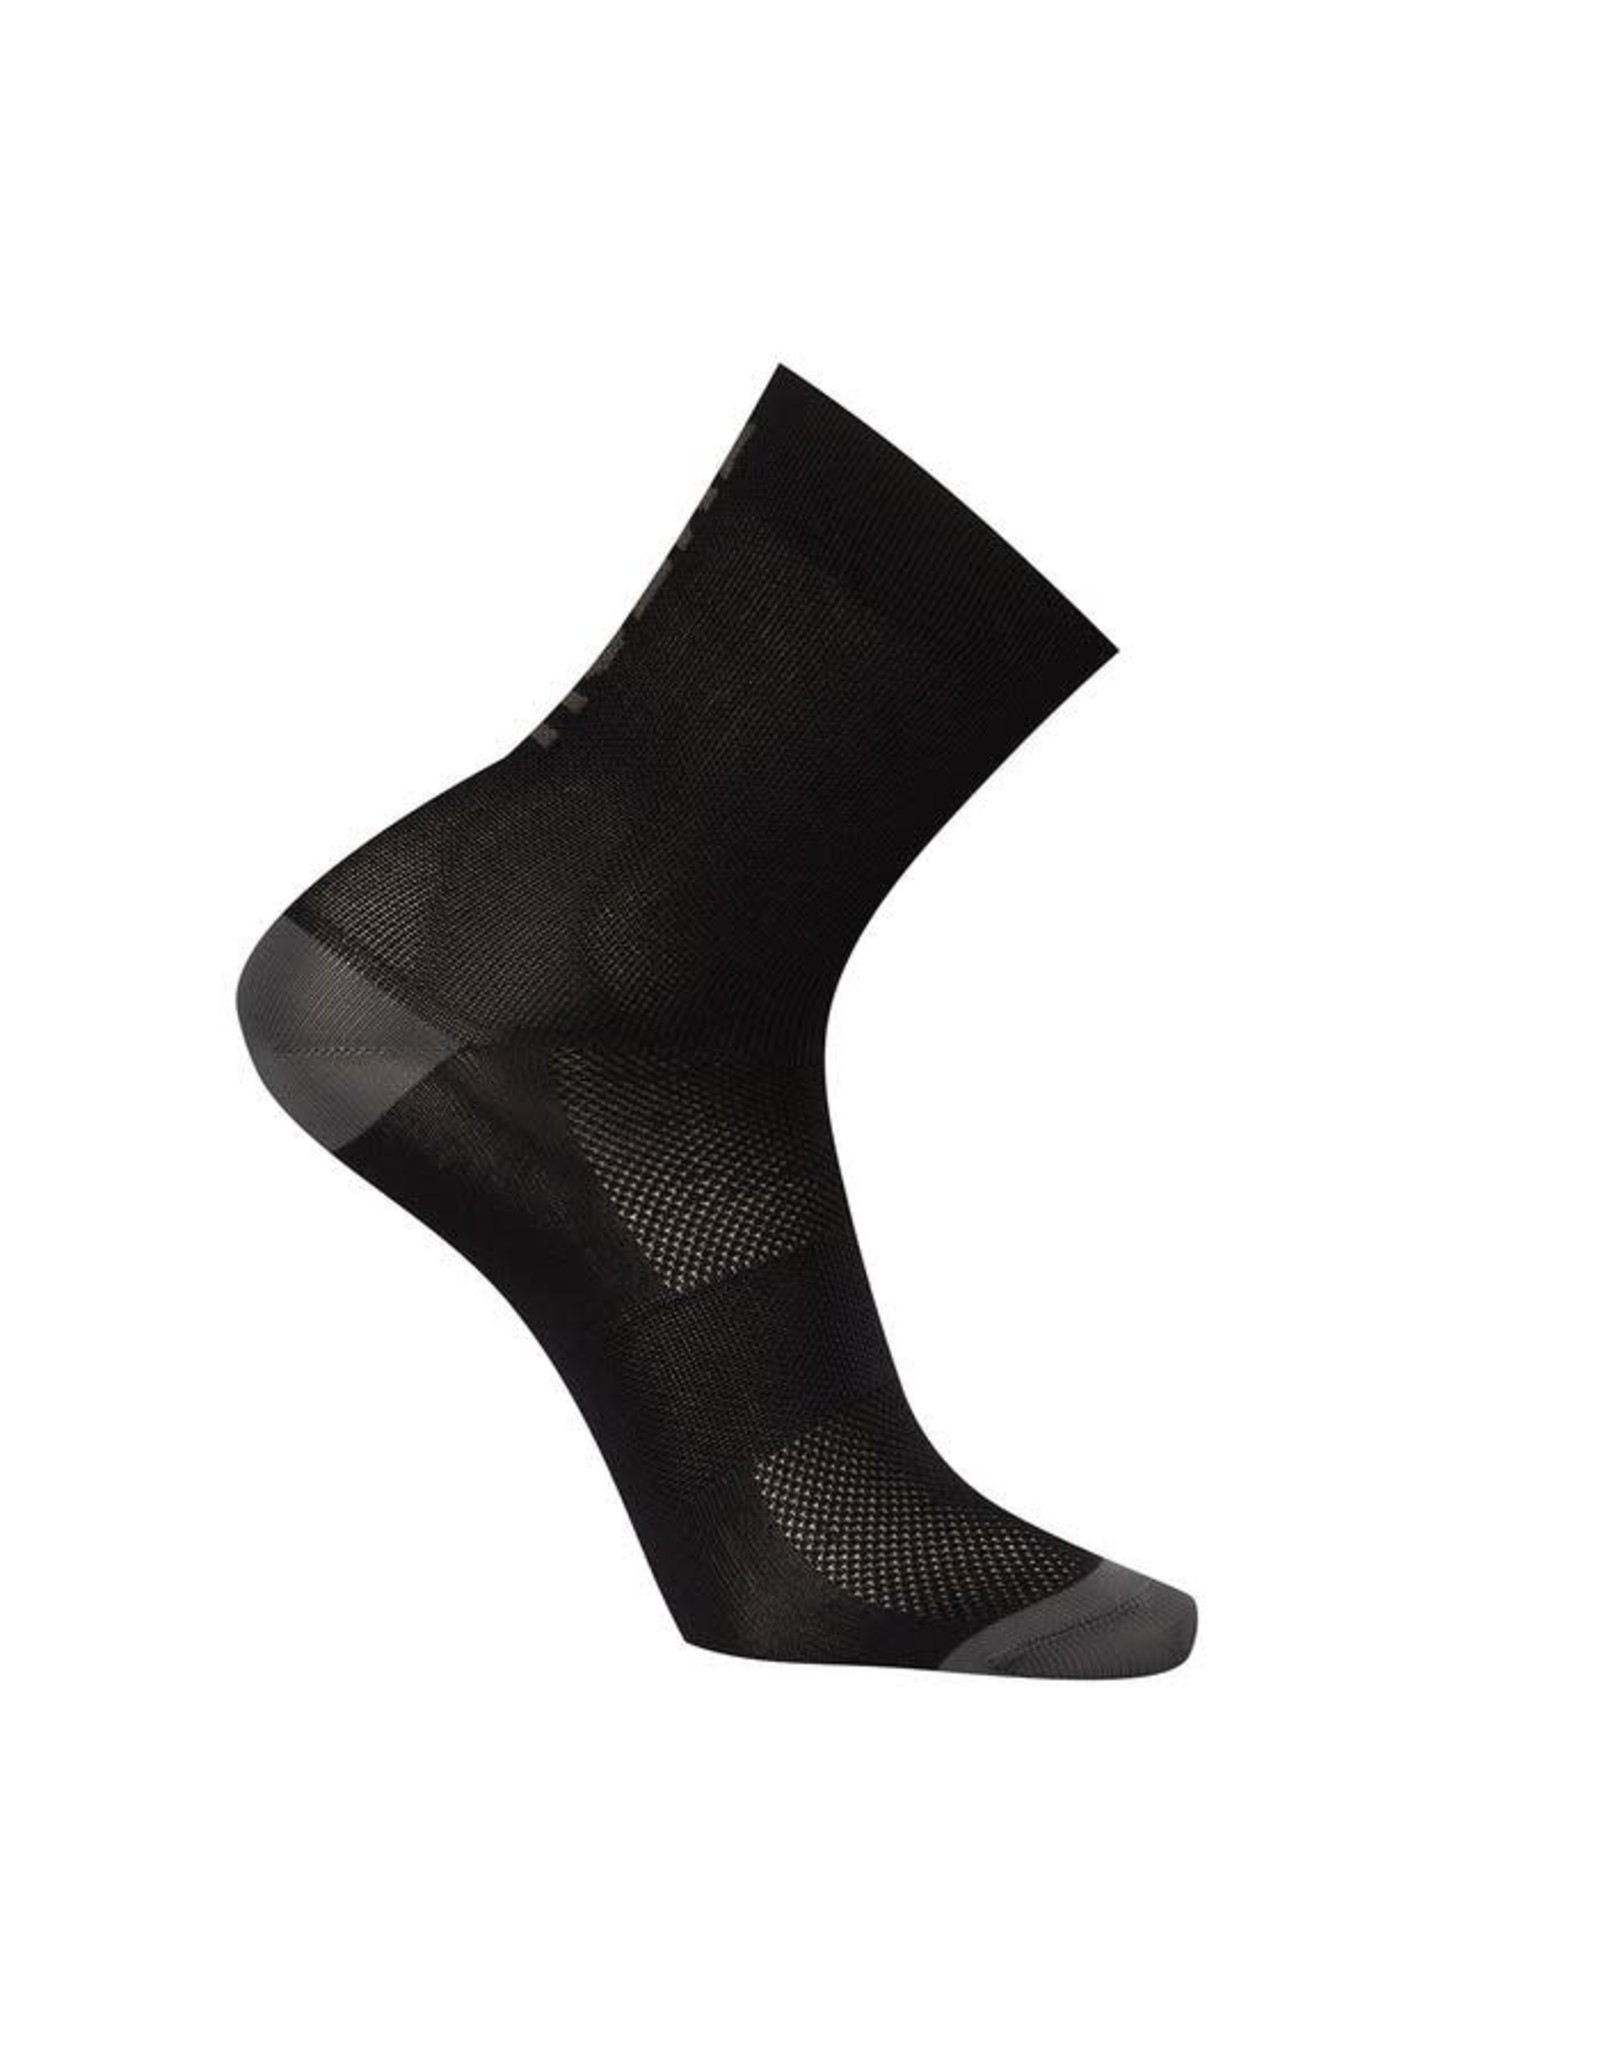 7MESH 7MESH - Word Sock Black Lrg